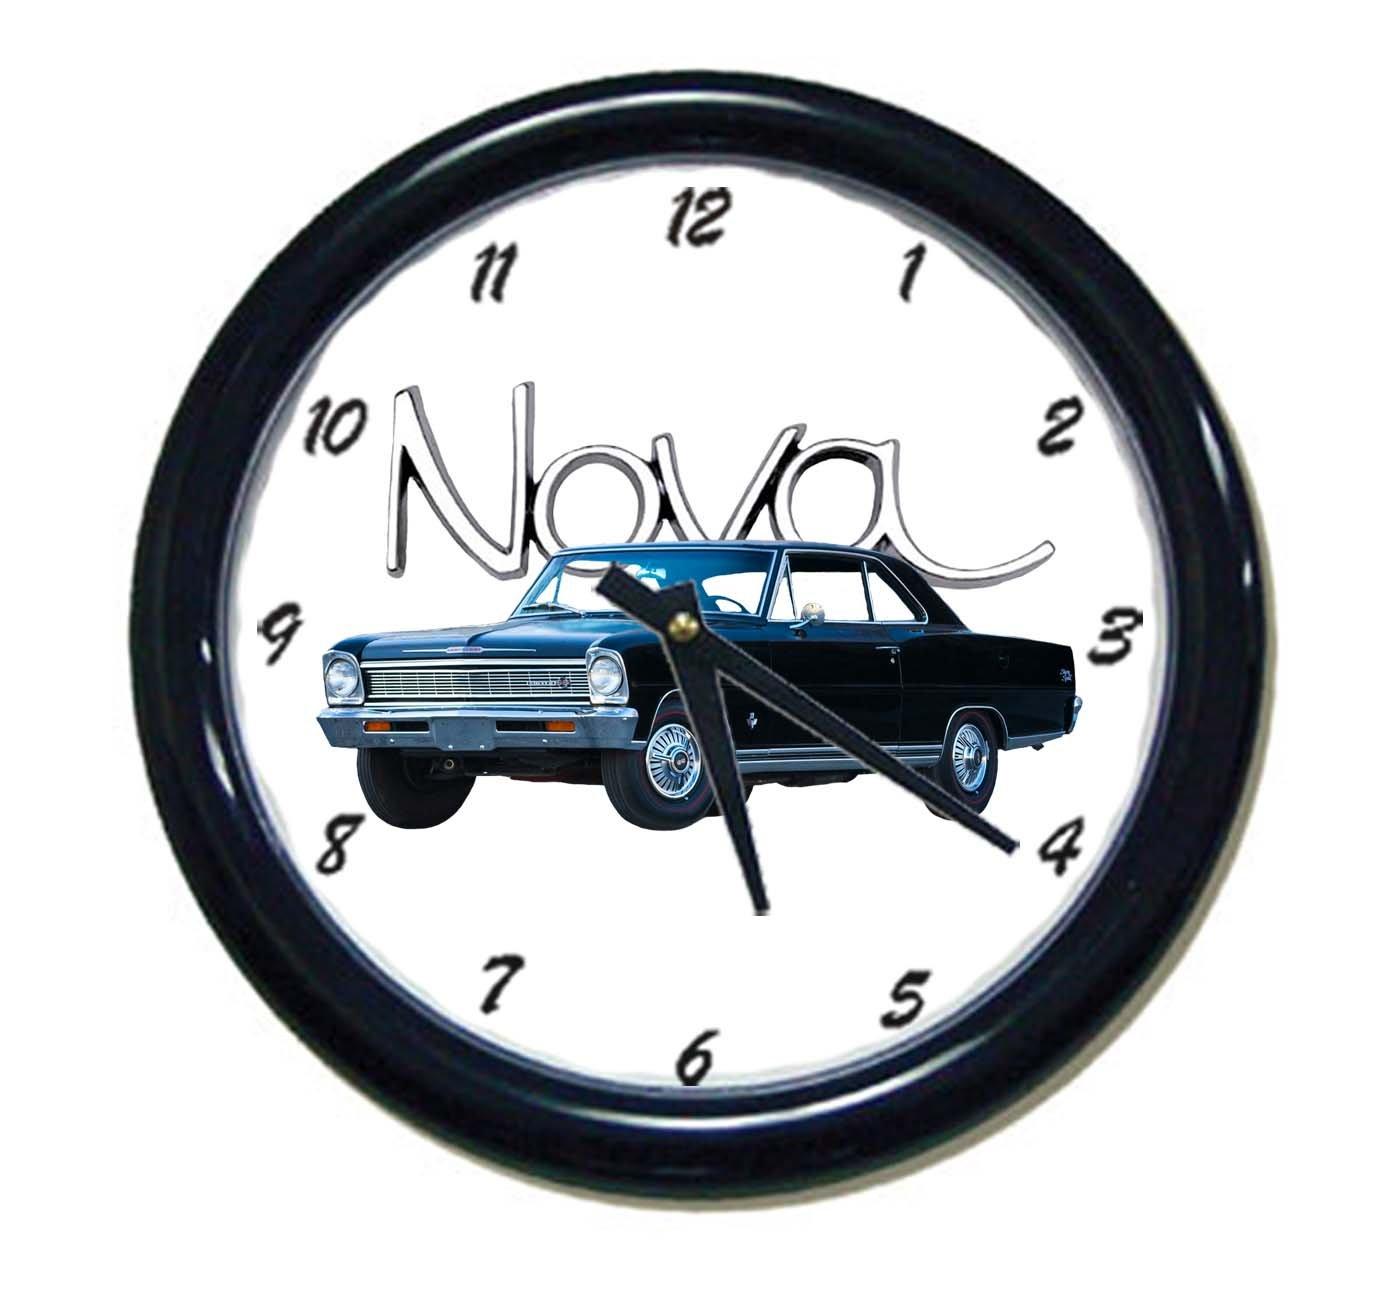 New 1966 Chevy Nova Car Wall Clock